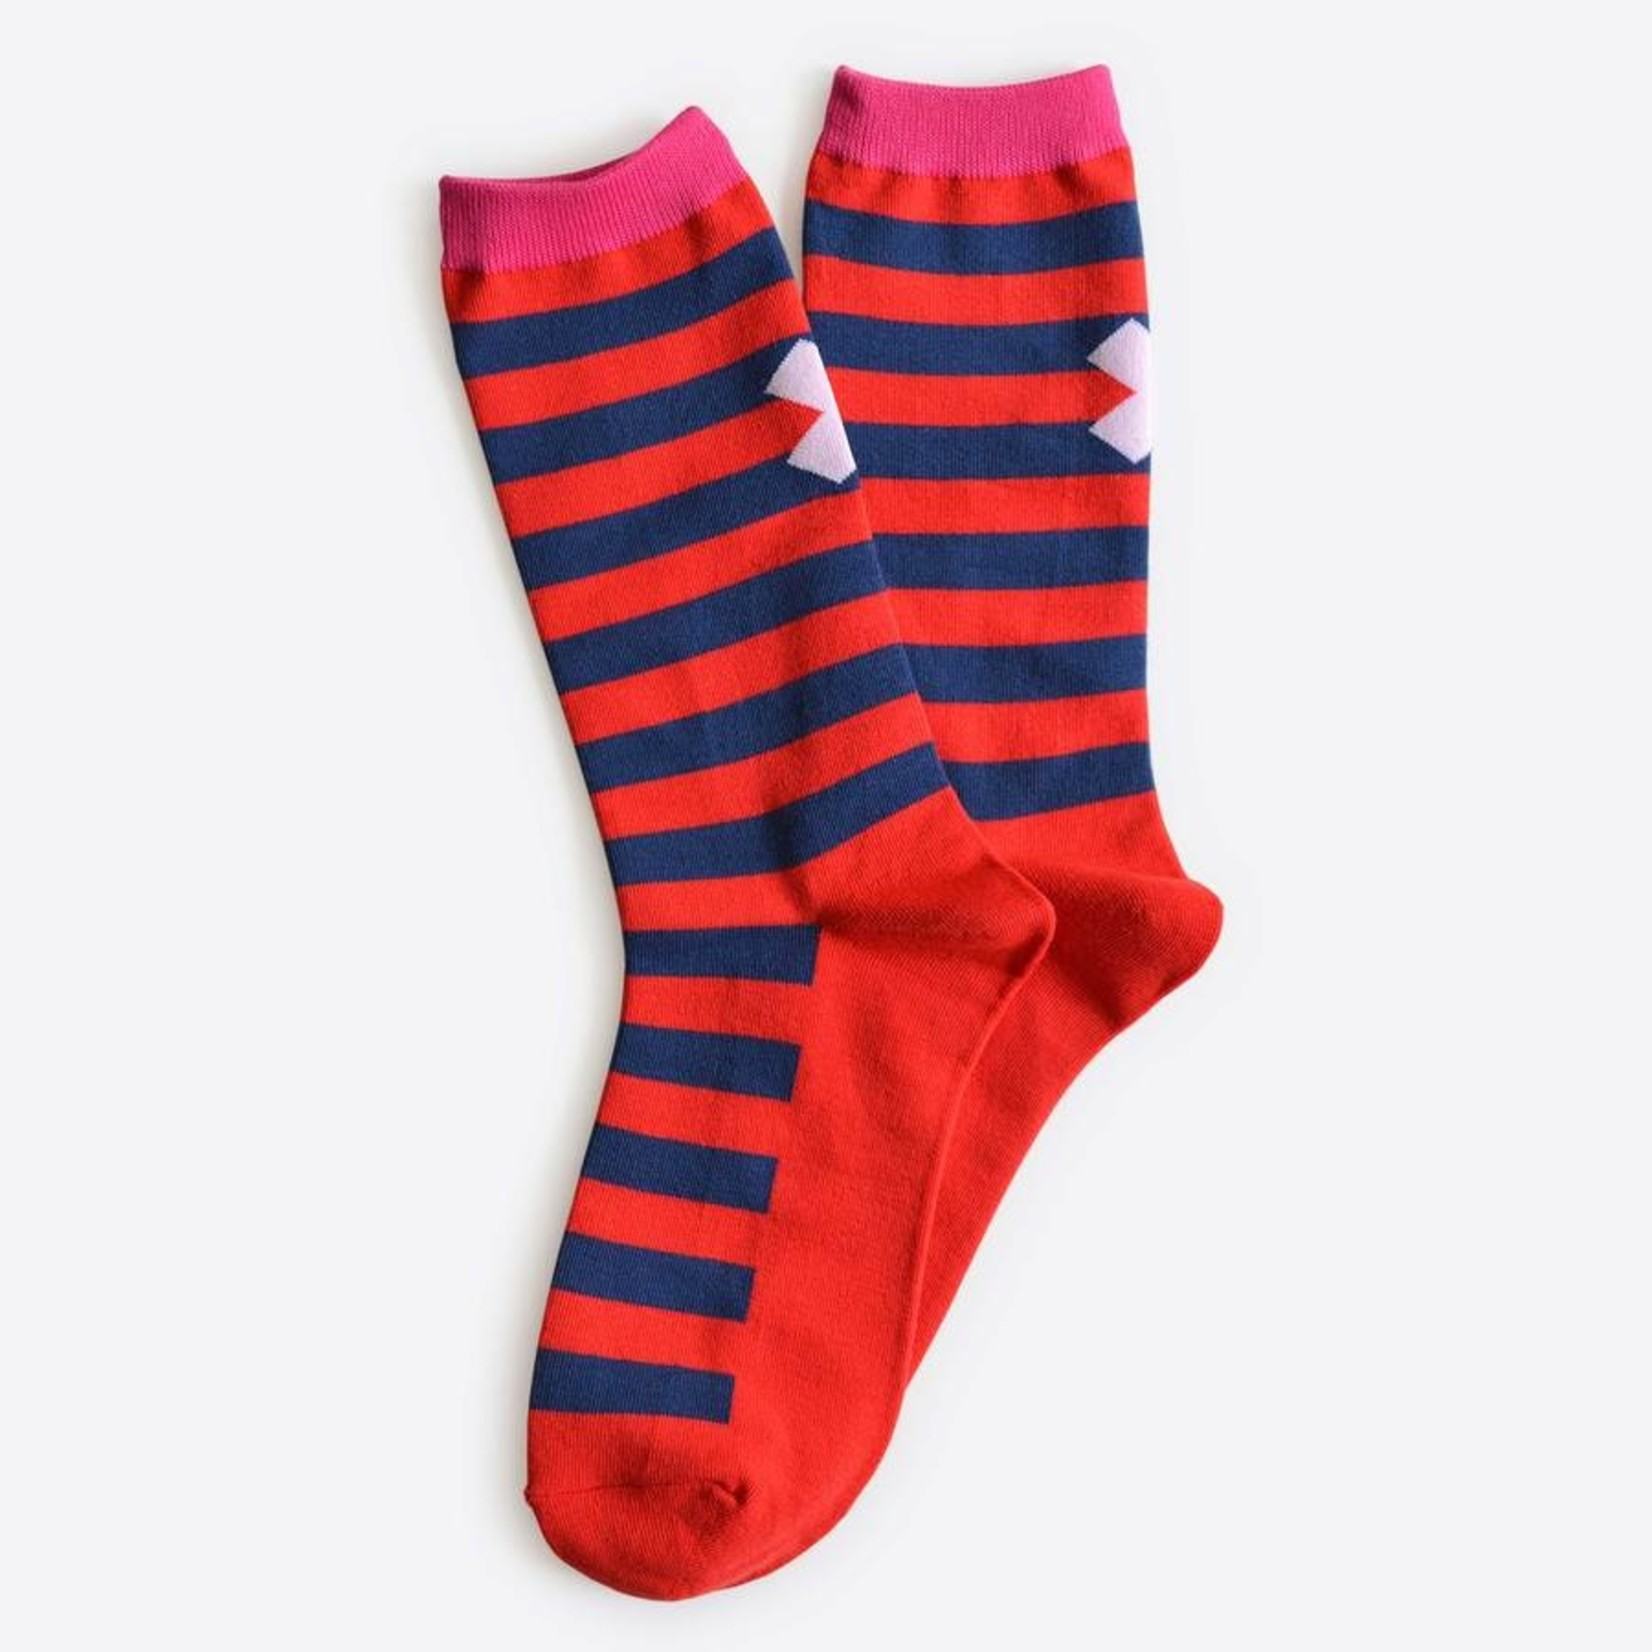 Hooray Sock Co. Taylor Cotton sock